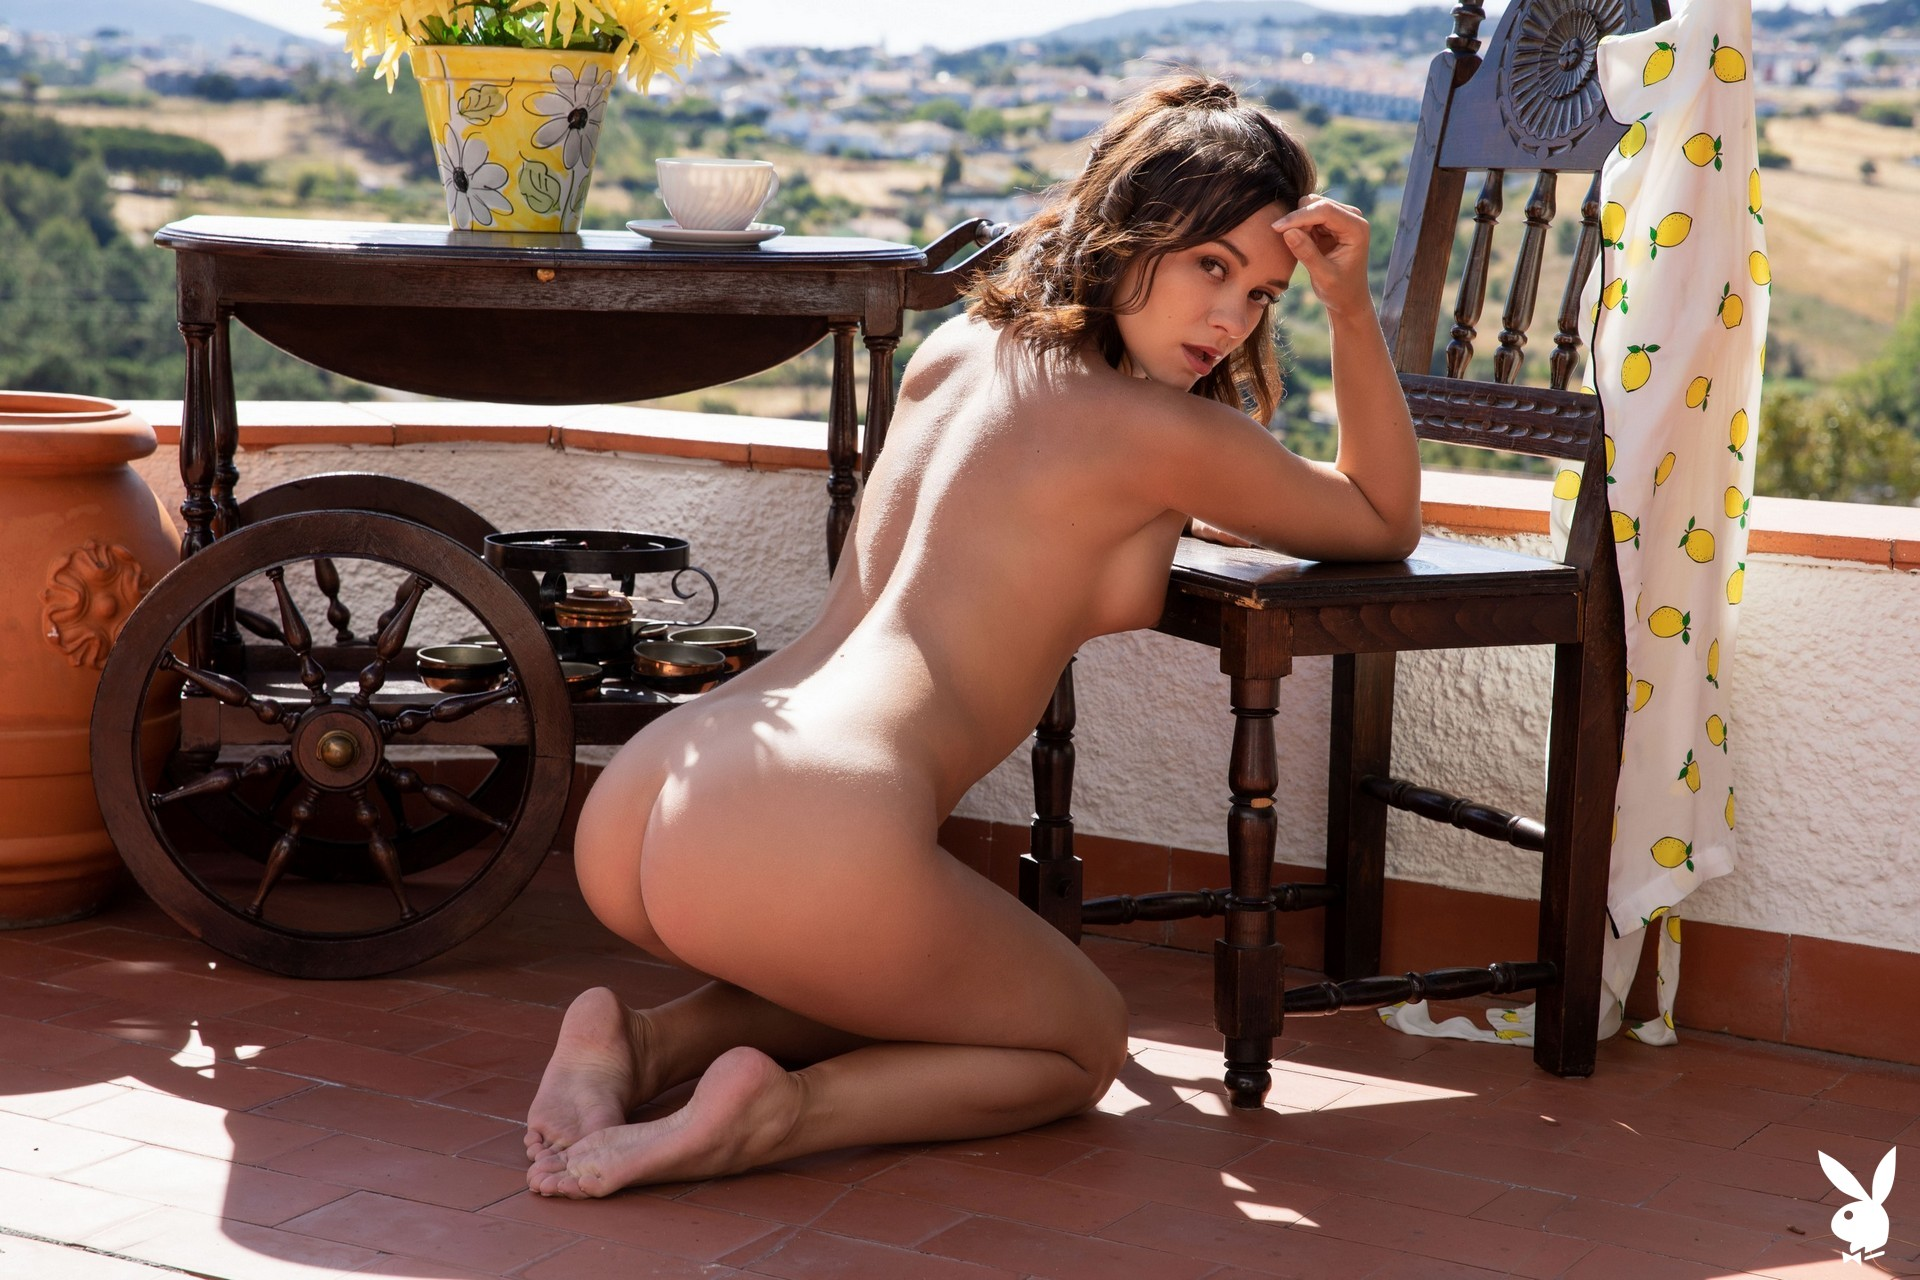 Marine Lecourt In Country Summit Playboy Plus (16)